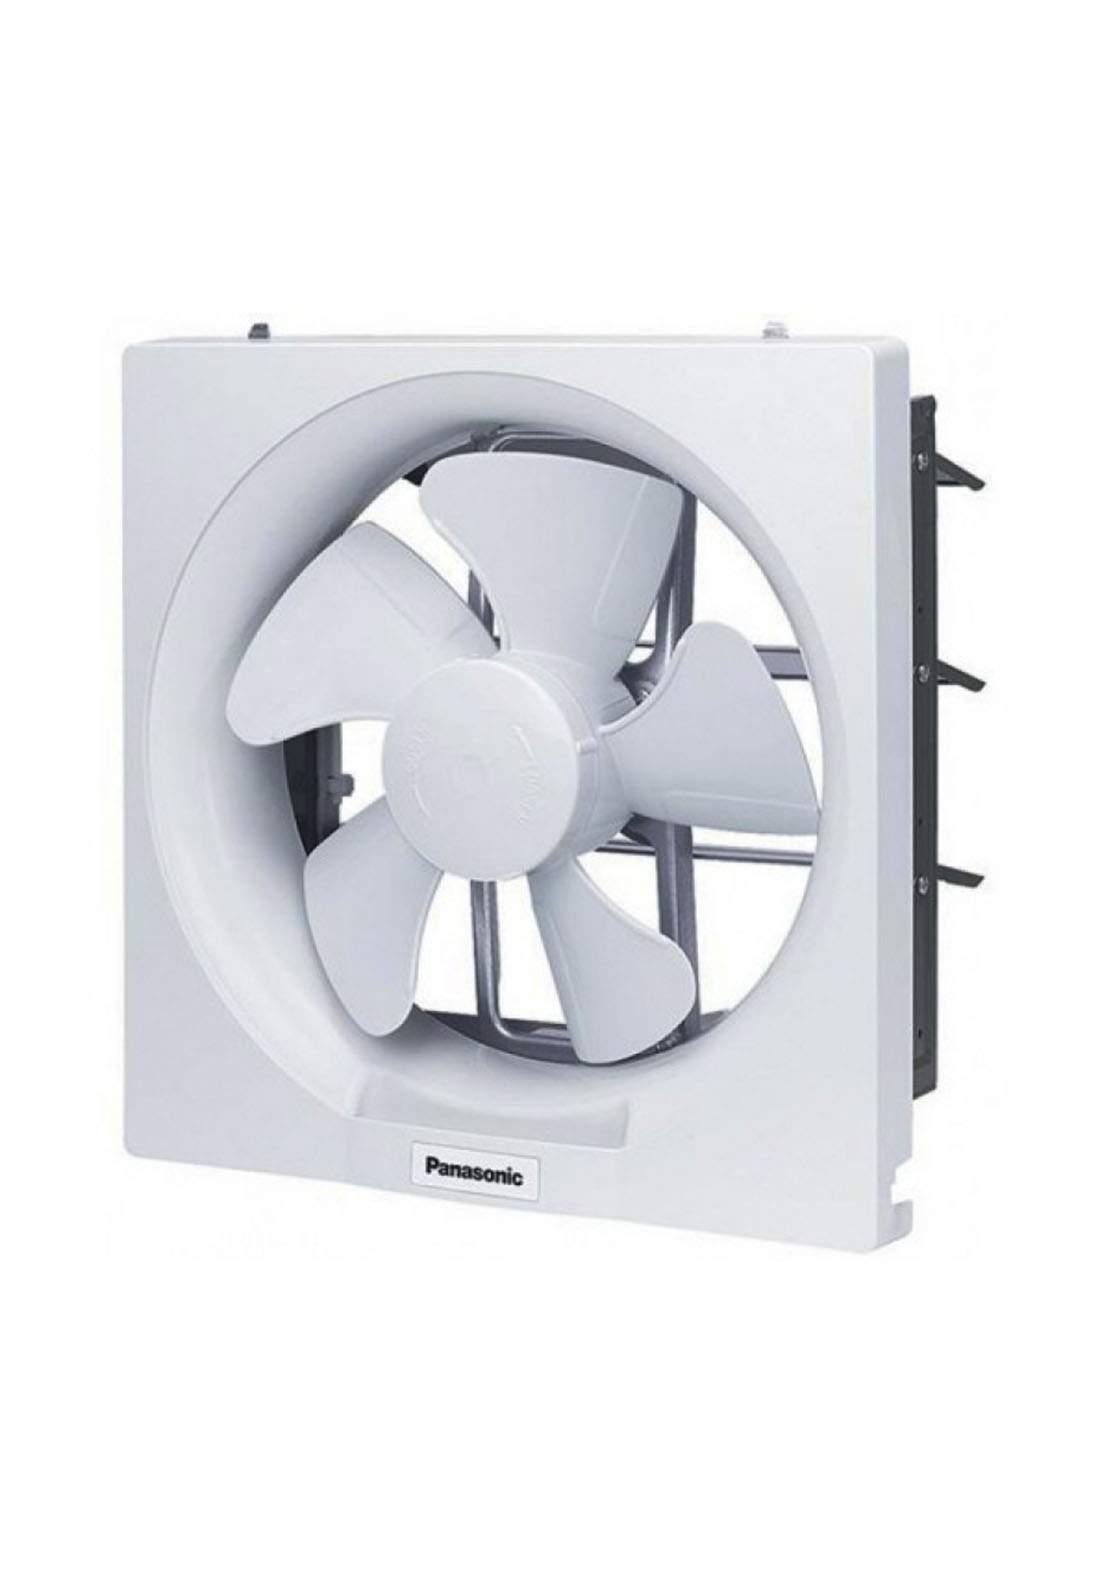 Panasonic FV-30AU9TNBMG Ventilating Fans 30 cm ساحبة هوائية